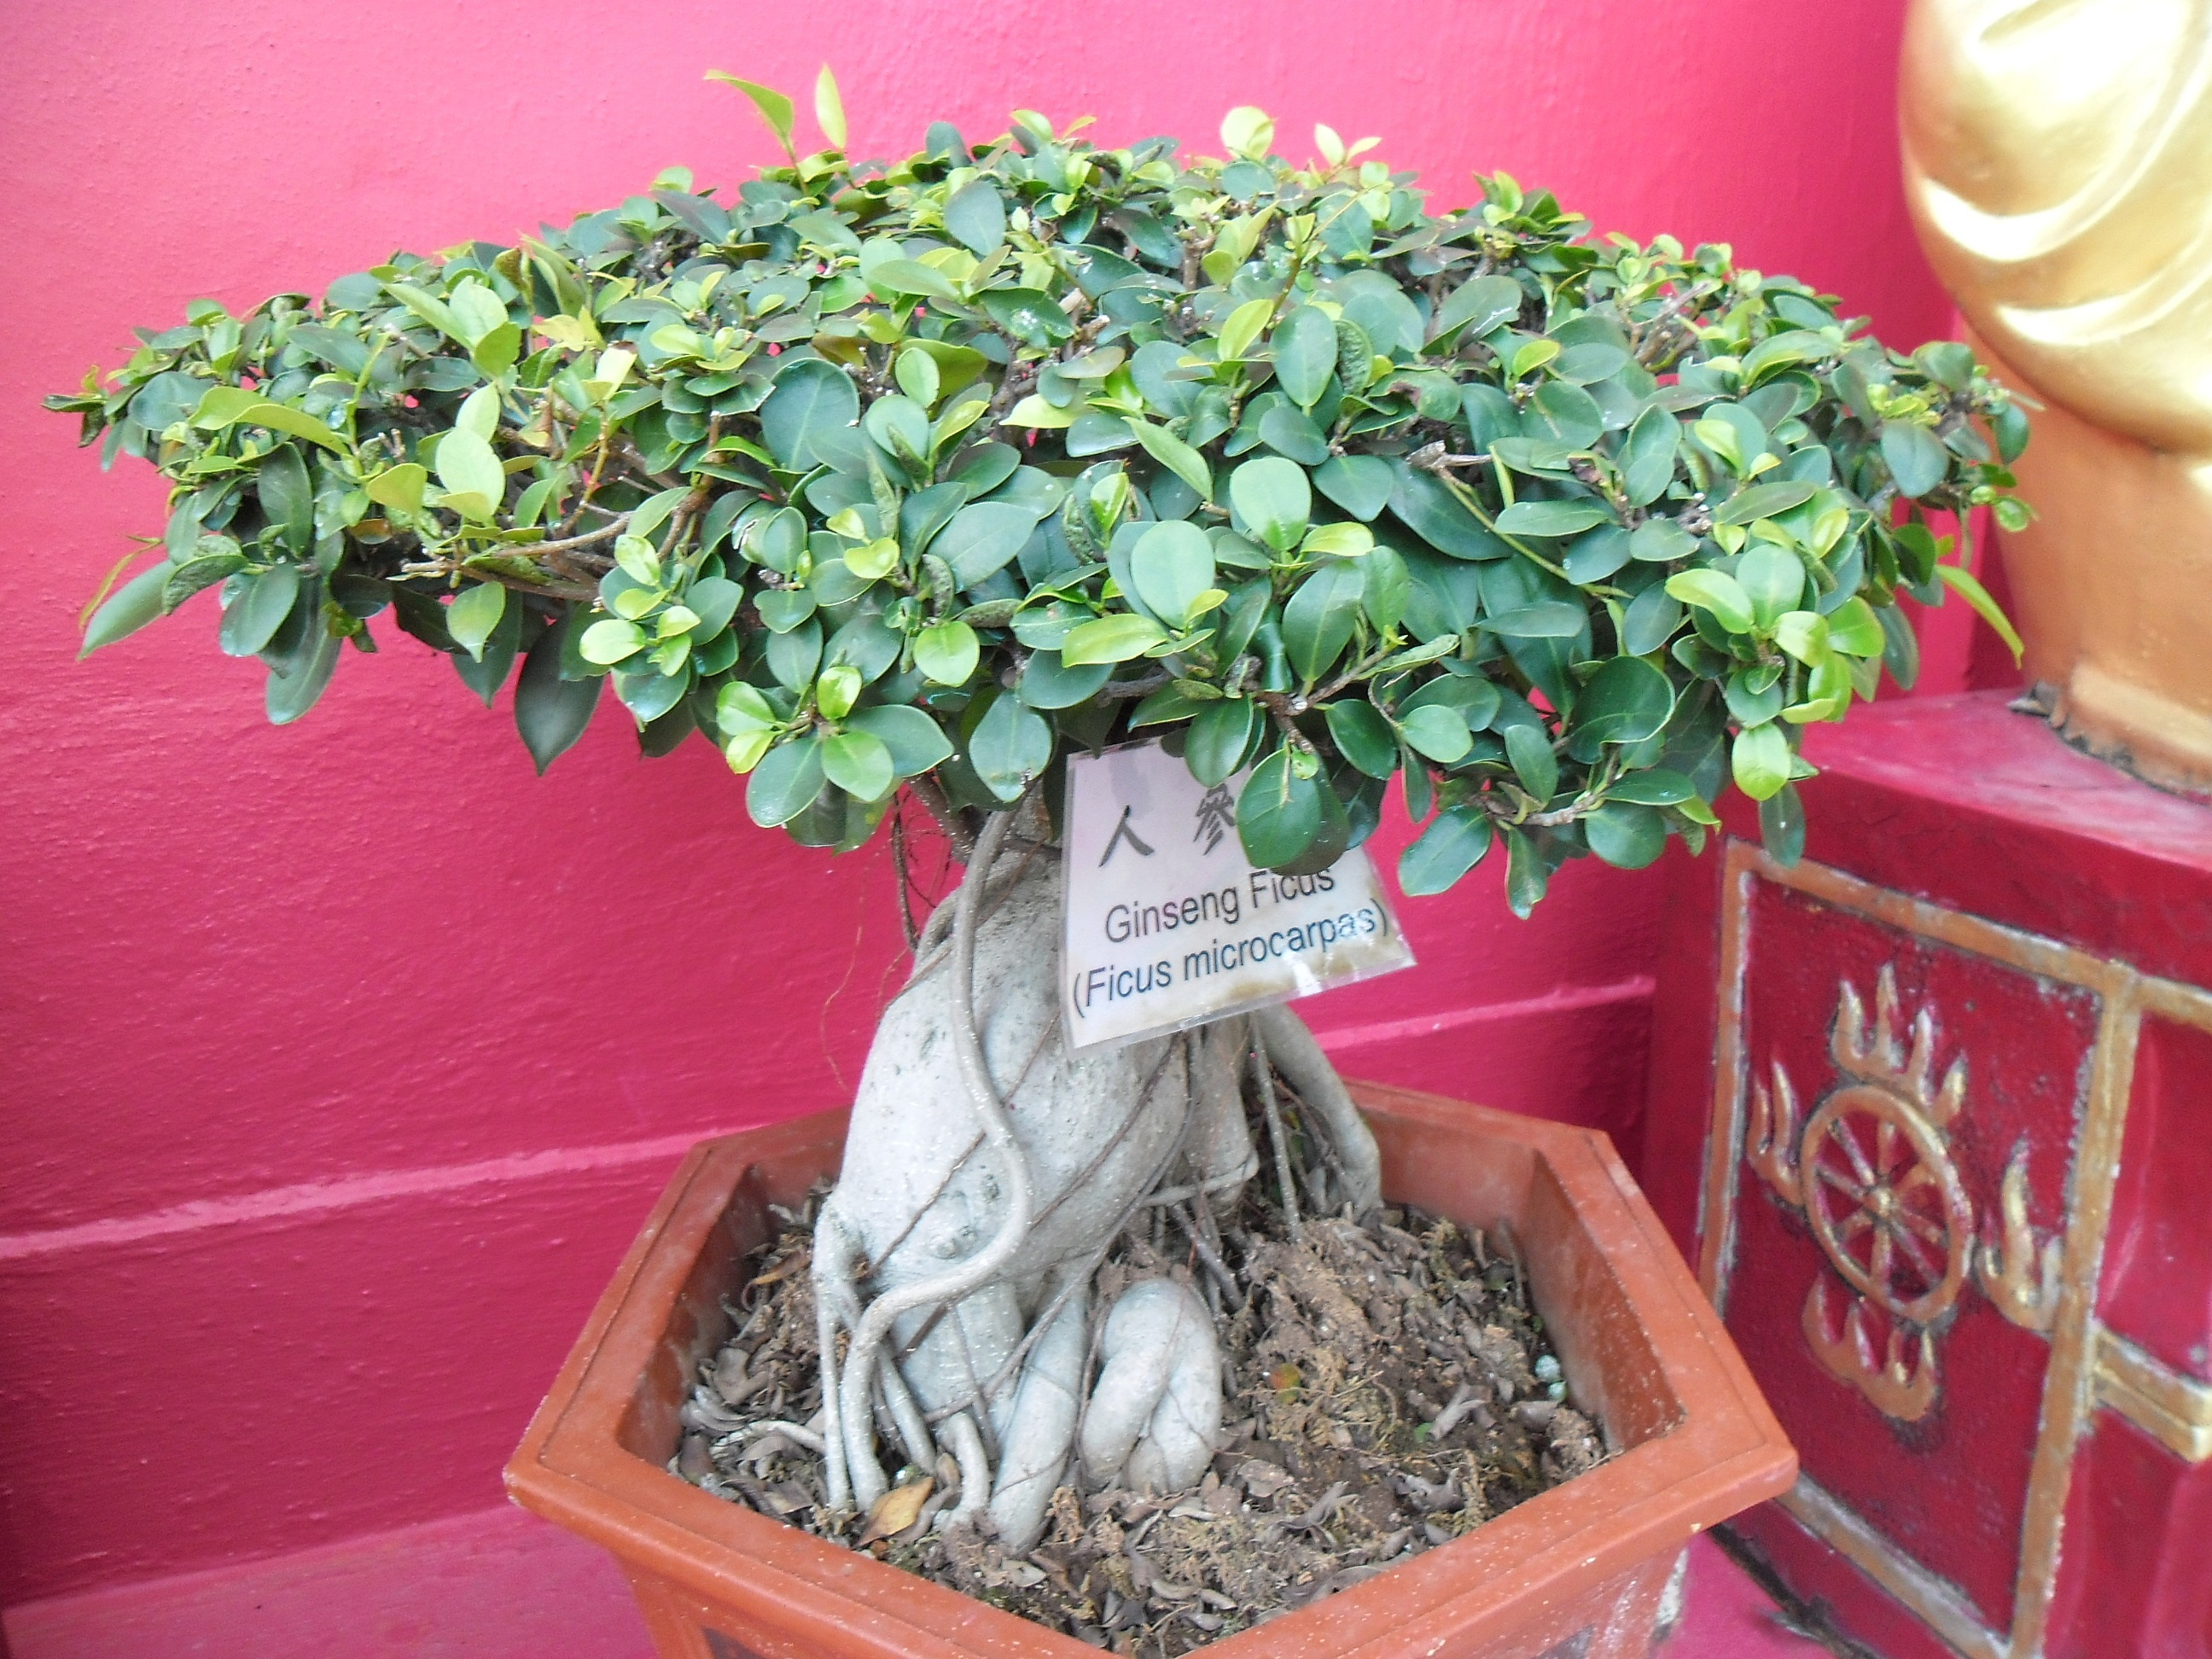 File:Ginseng Ficus Hong Kong.jpg - Wikimedia Commons